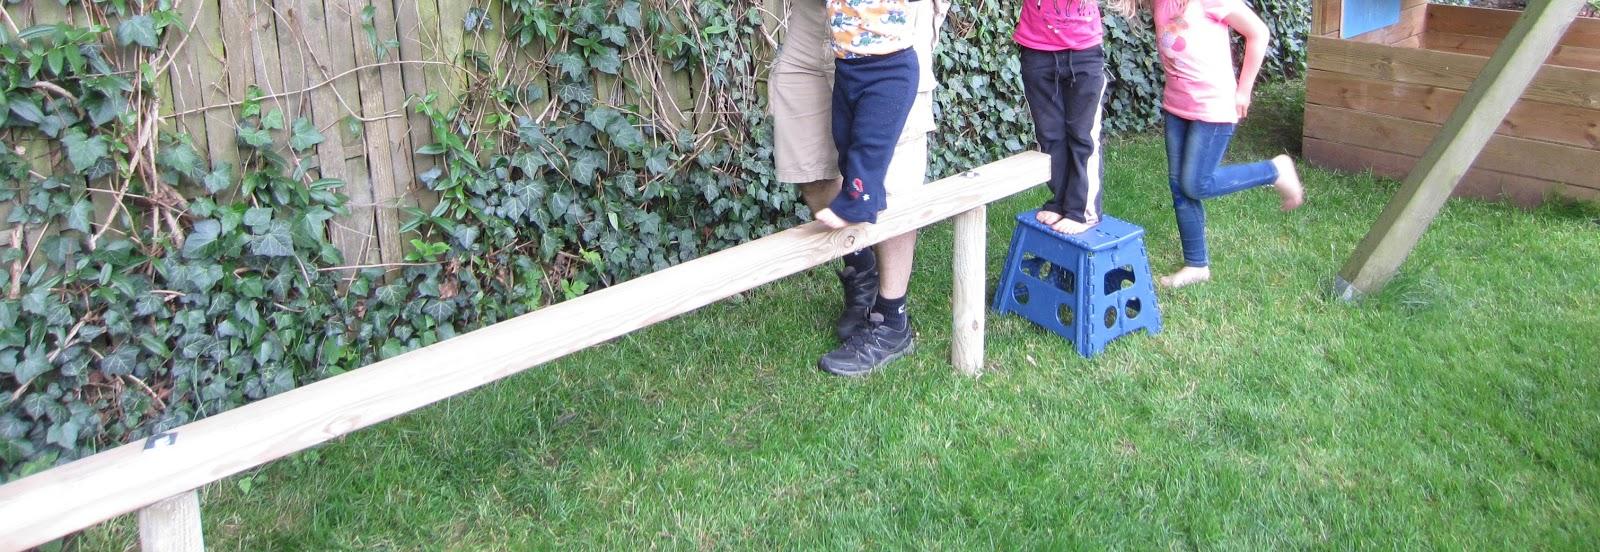 Gartenmobel Rattan Kunststoff :  Kinder  und Familien  Blog Balancierbalken für Kinder selber bauen